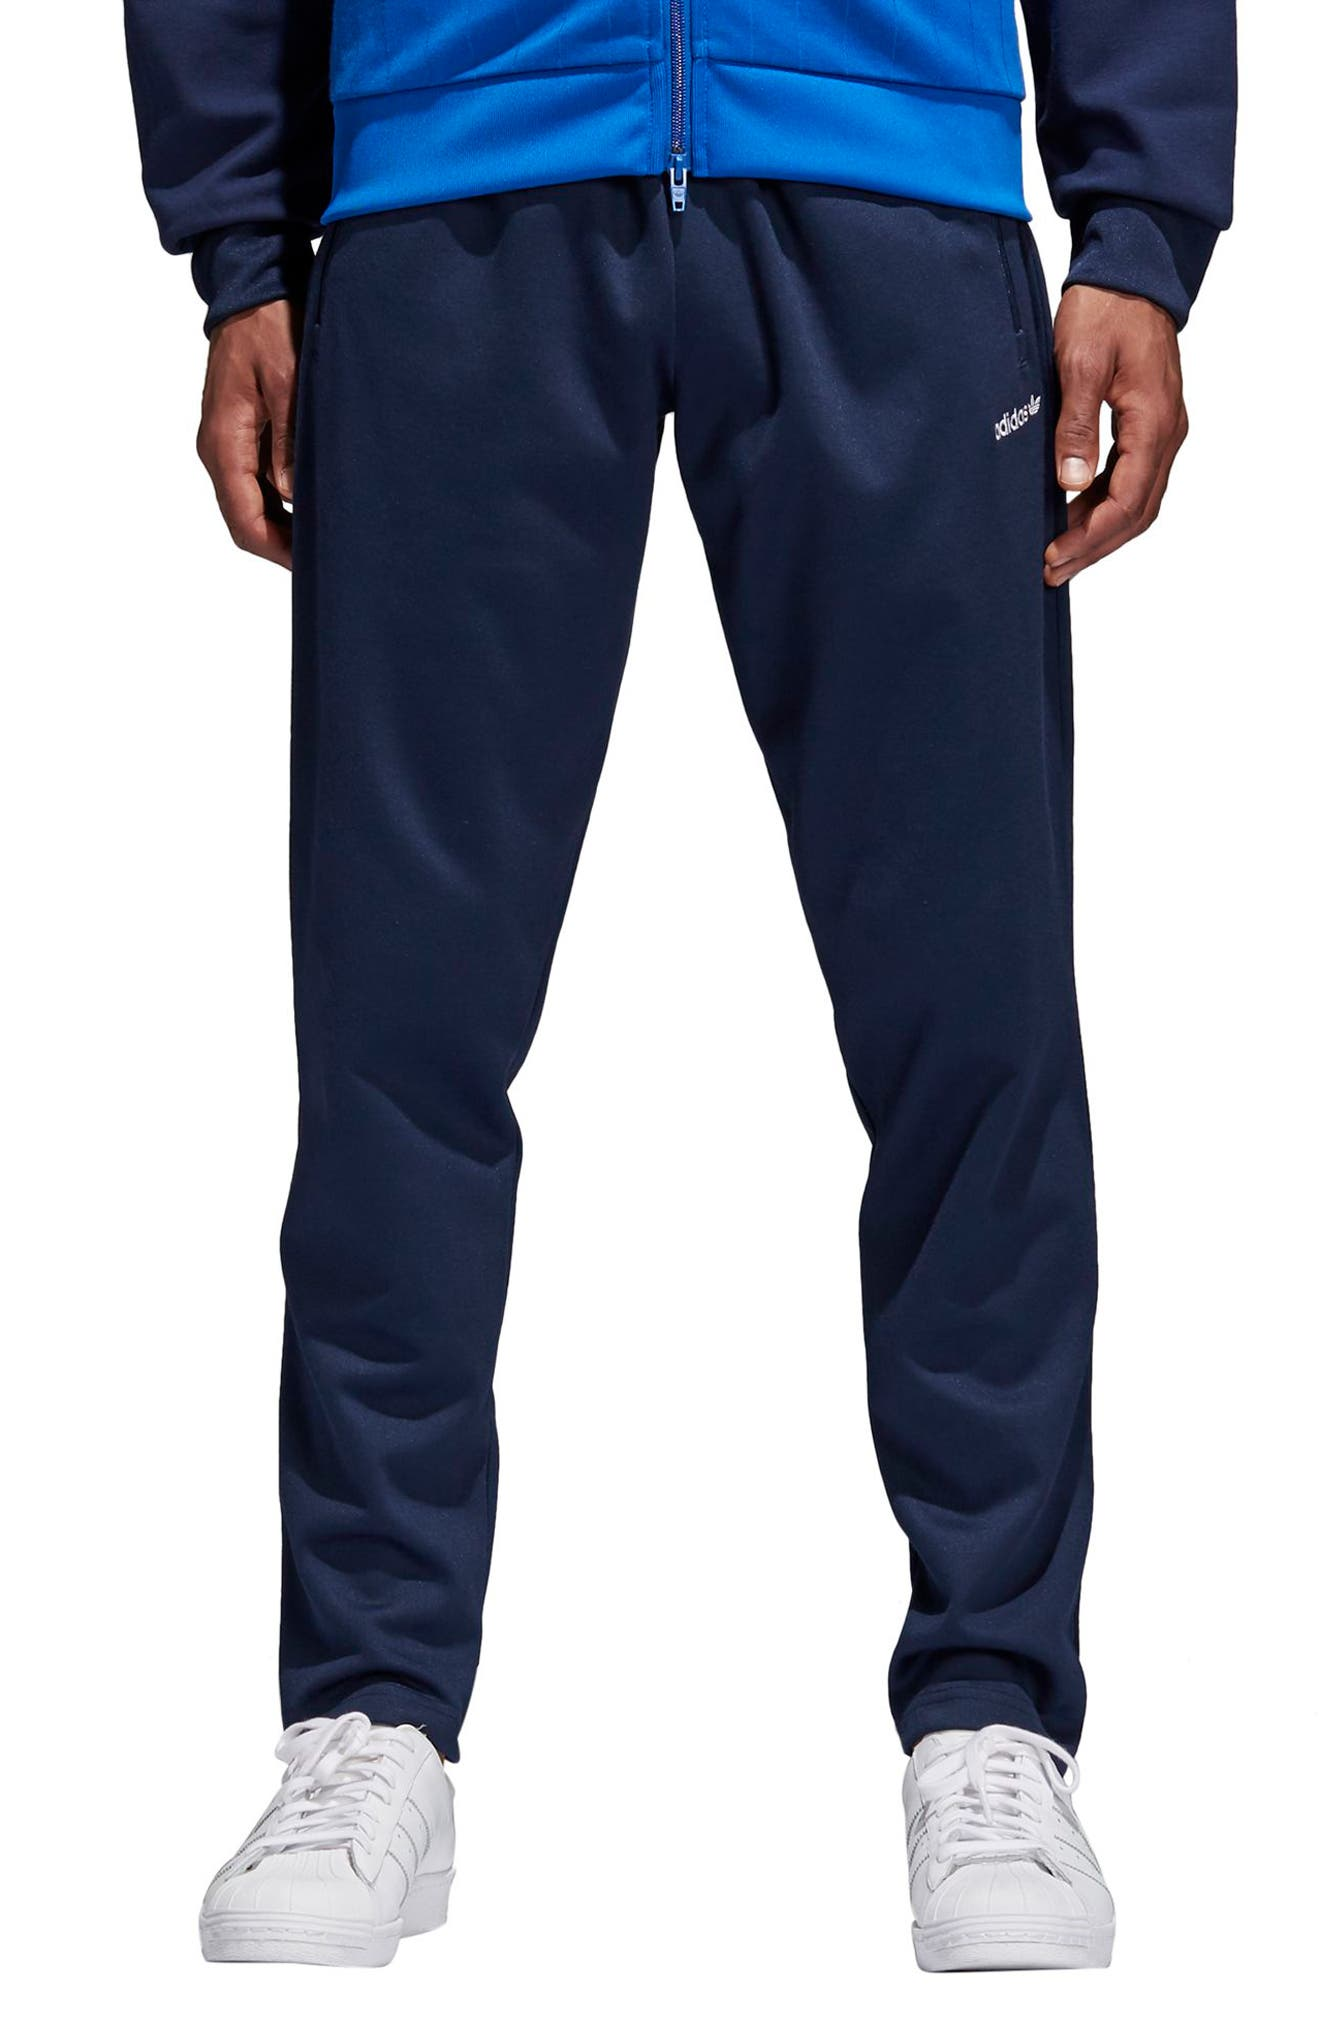 Originals Training Pants,                             Main thumbnail 1, color,                             Collegiate Navy